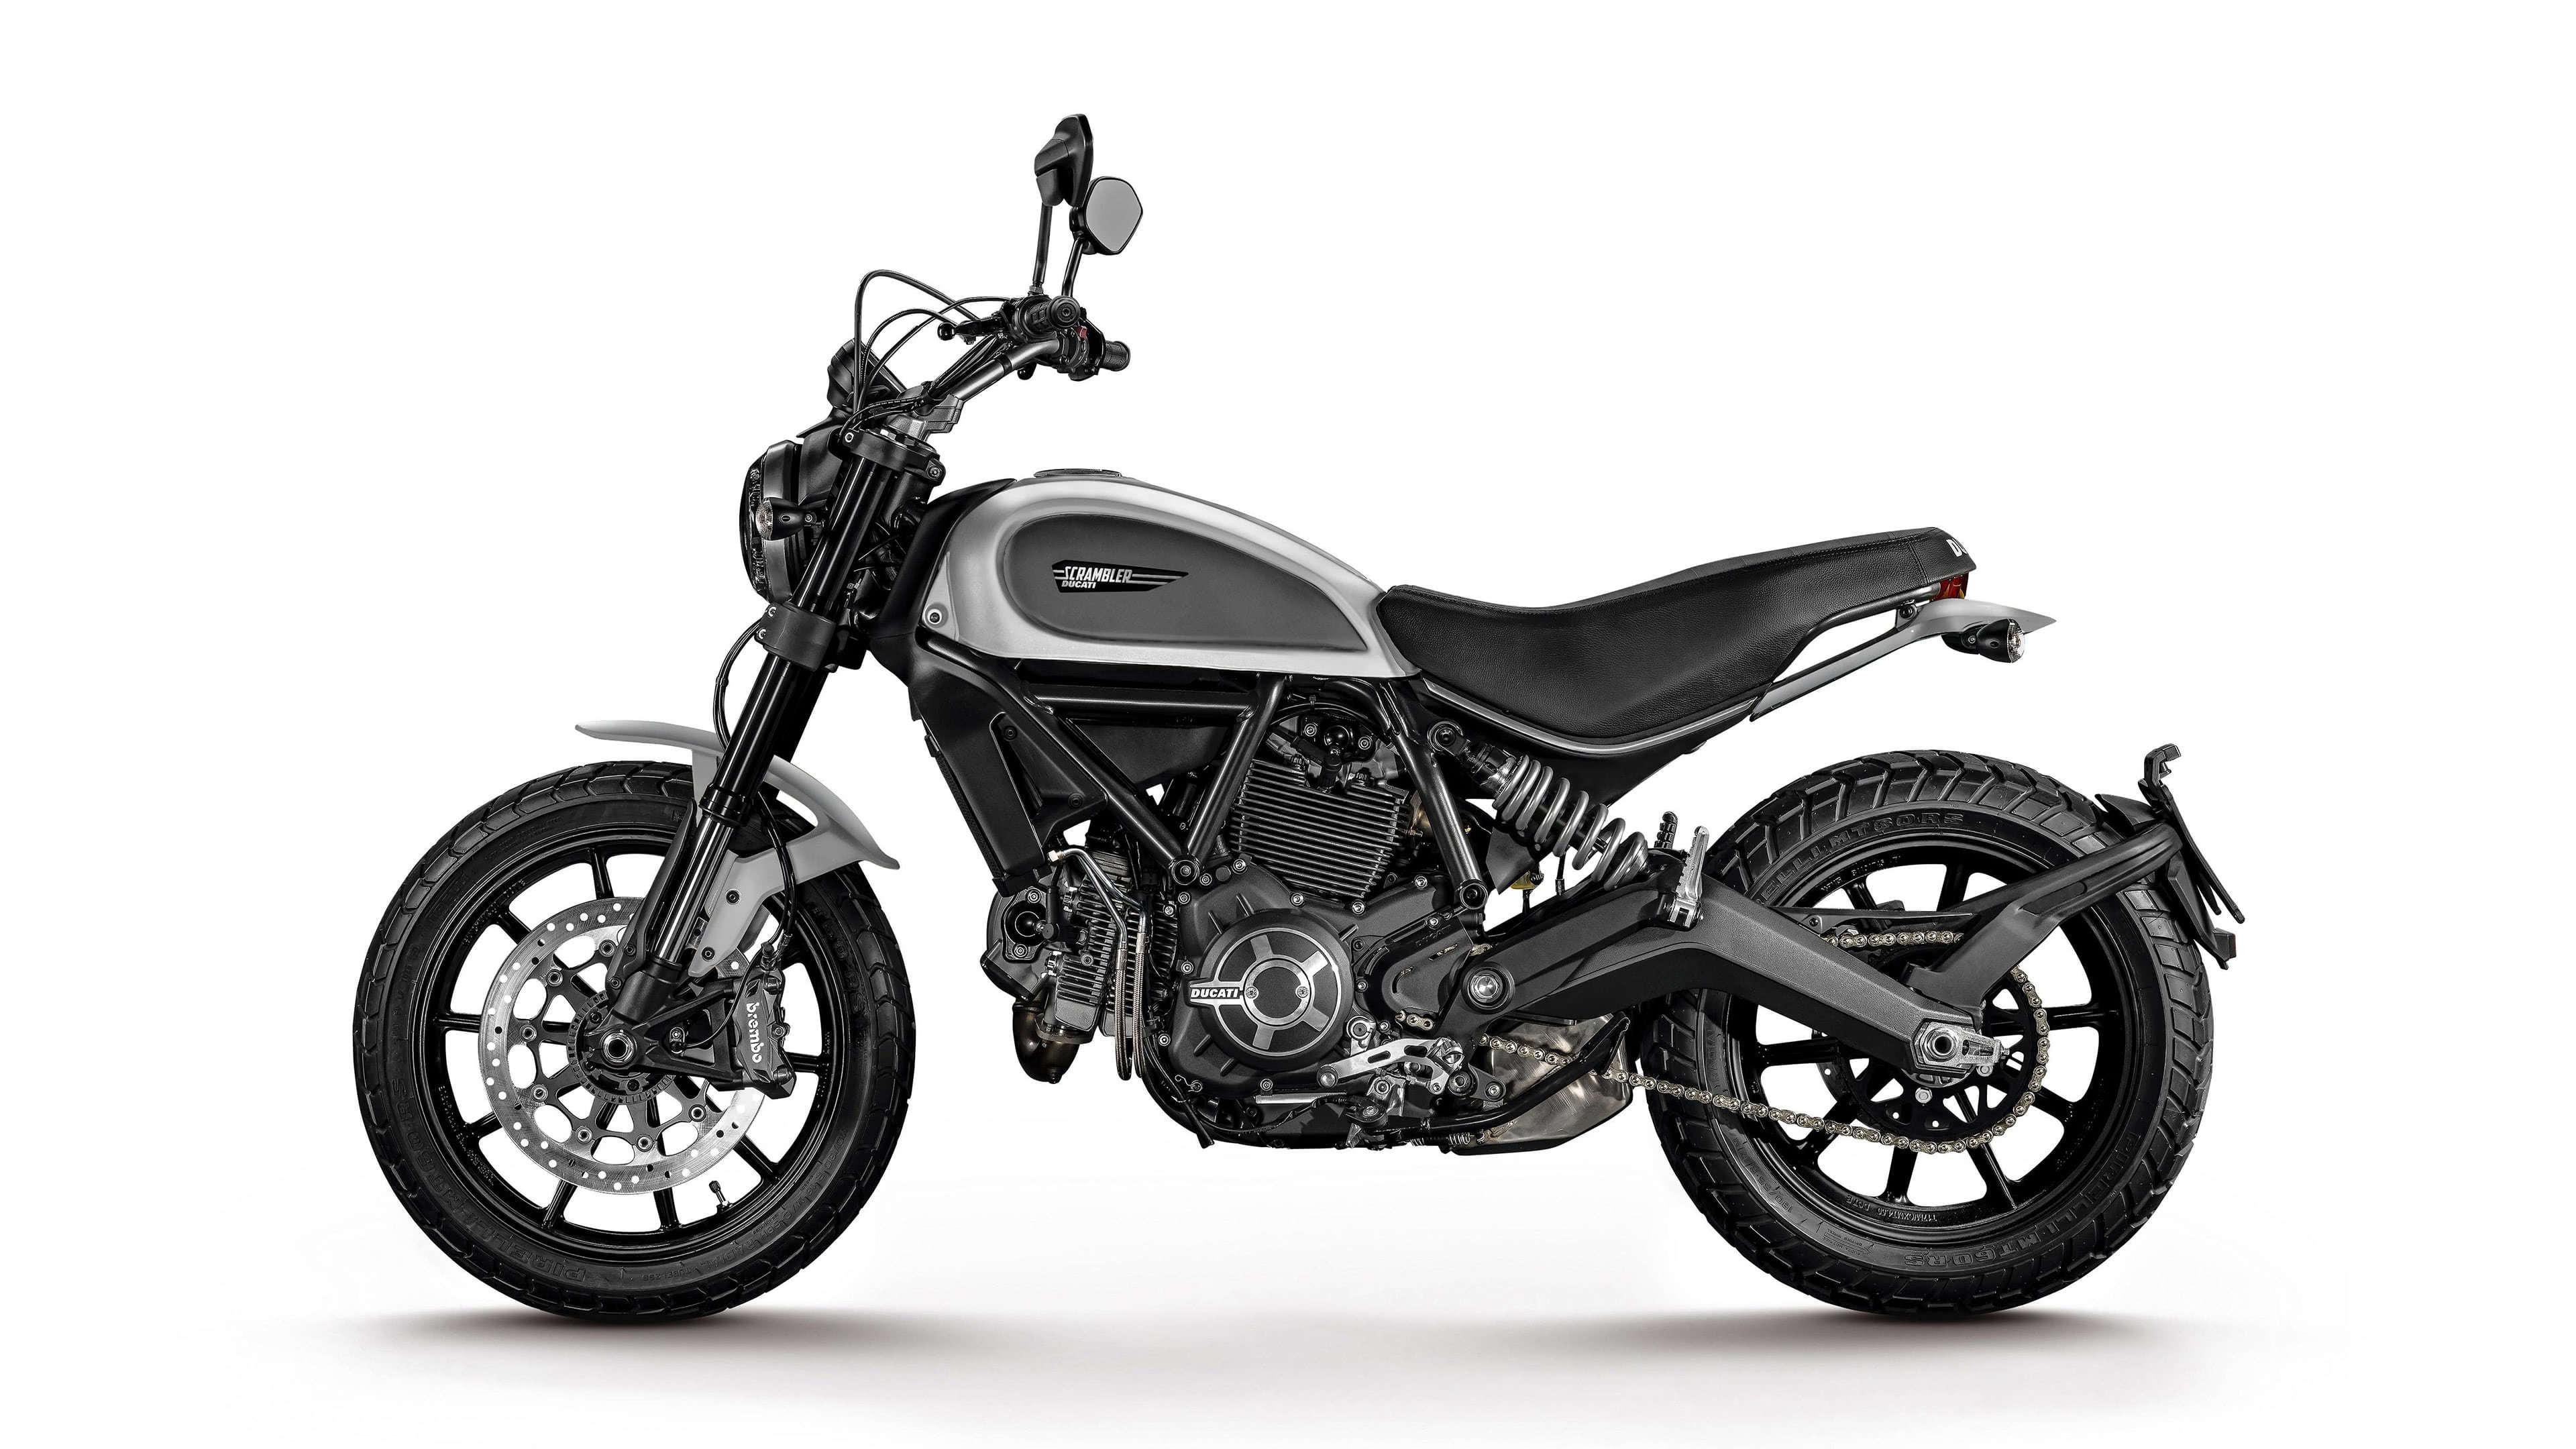 Ducati Scrambler Icon UHD 4K Wallpaper